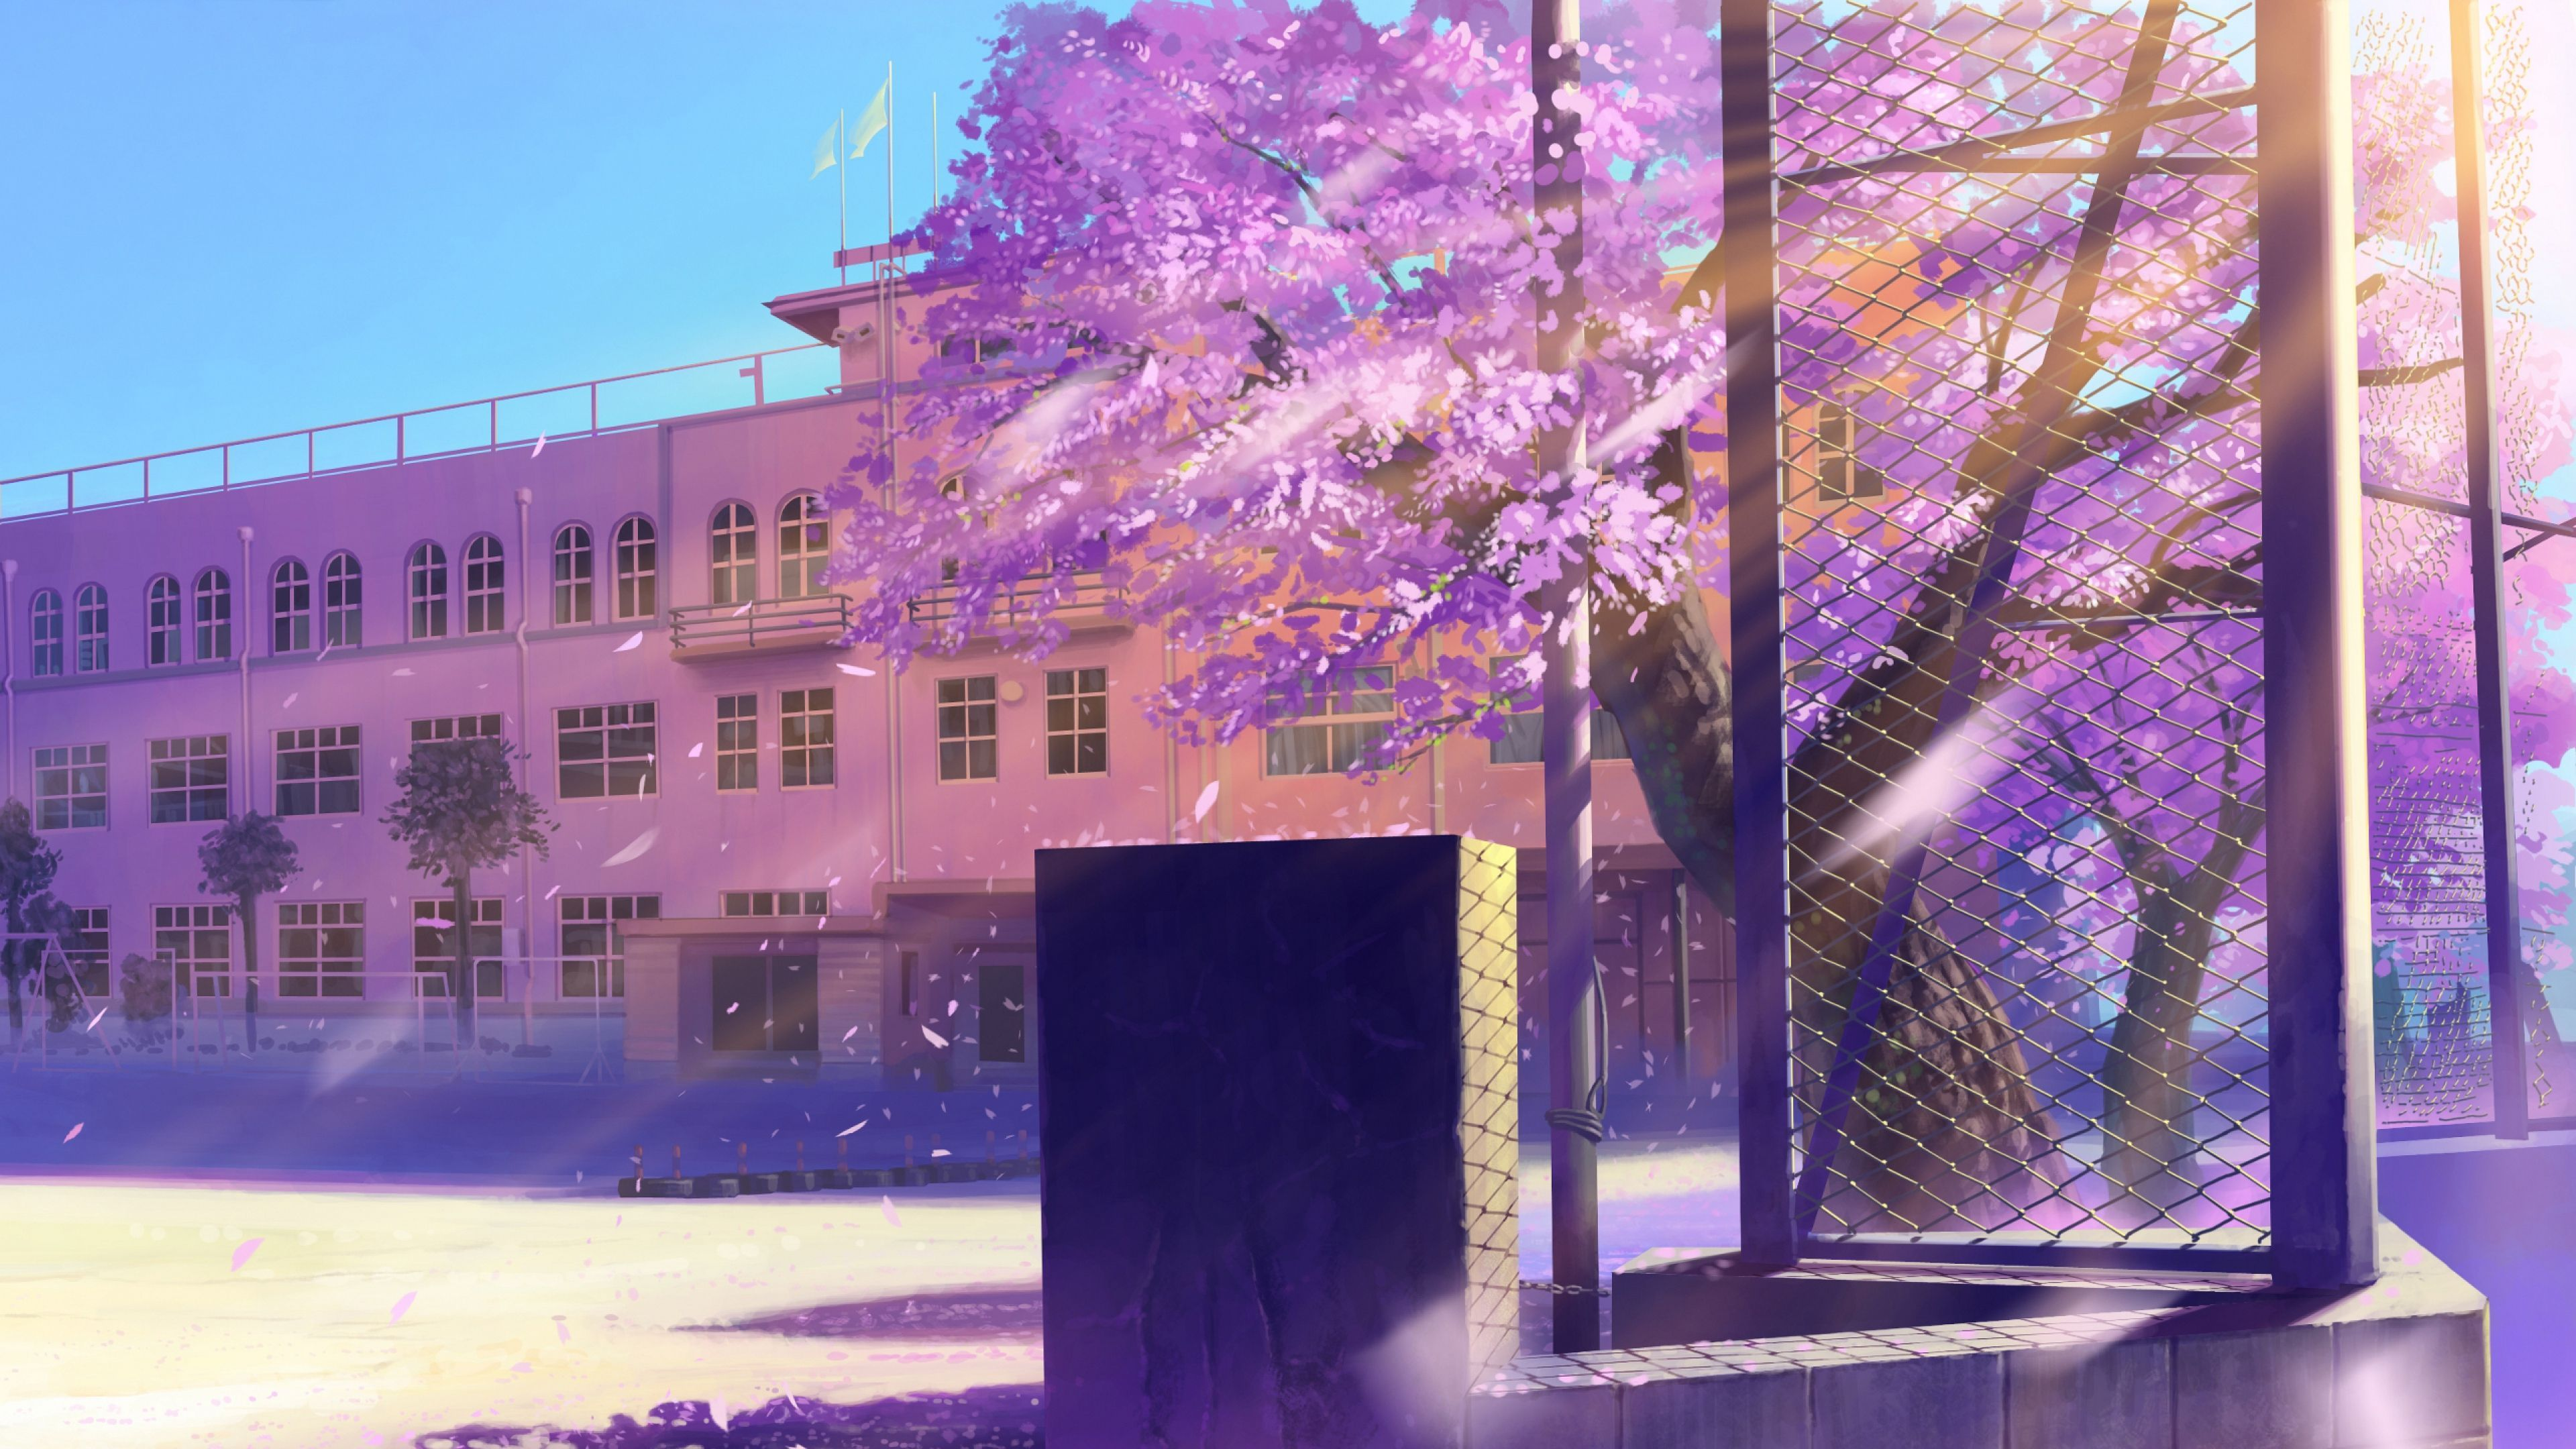 Anime Street 4k Wallpapers - Wallpaper Cave